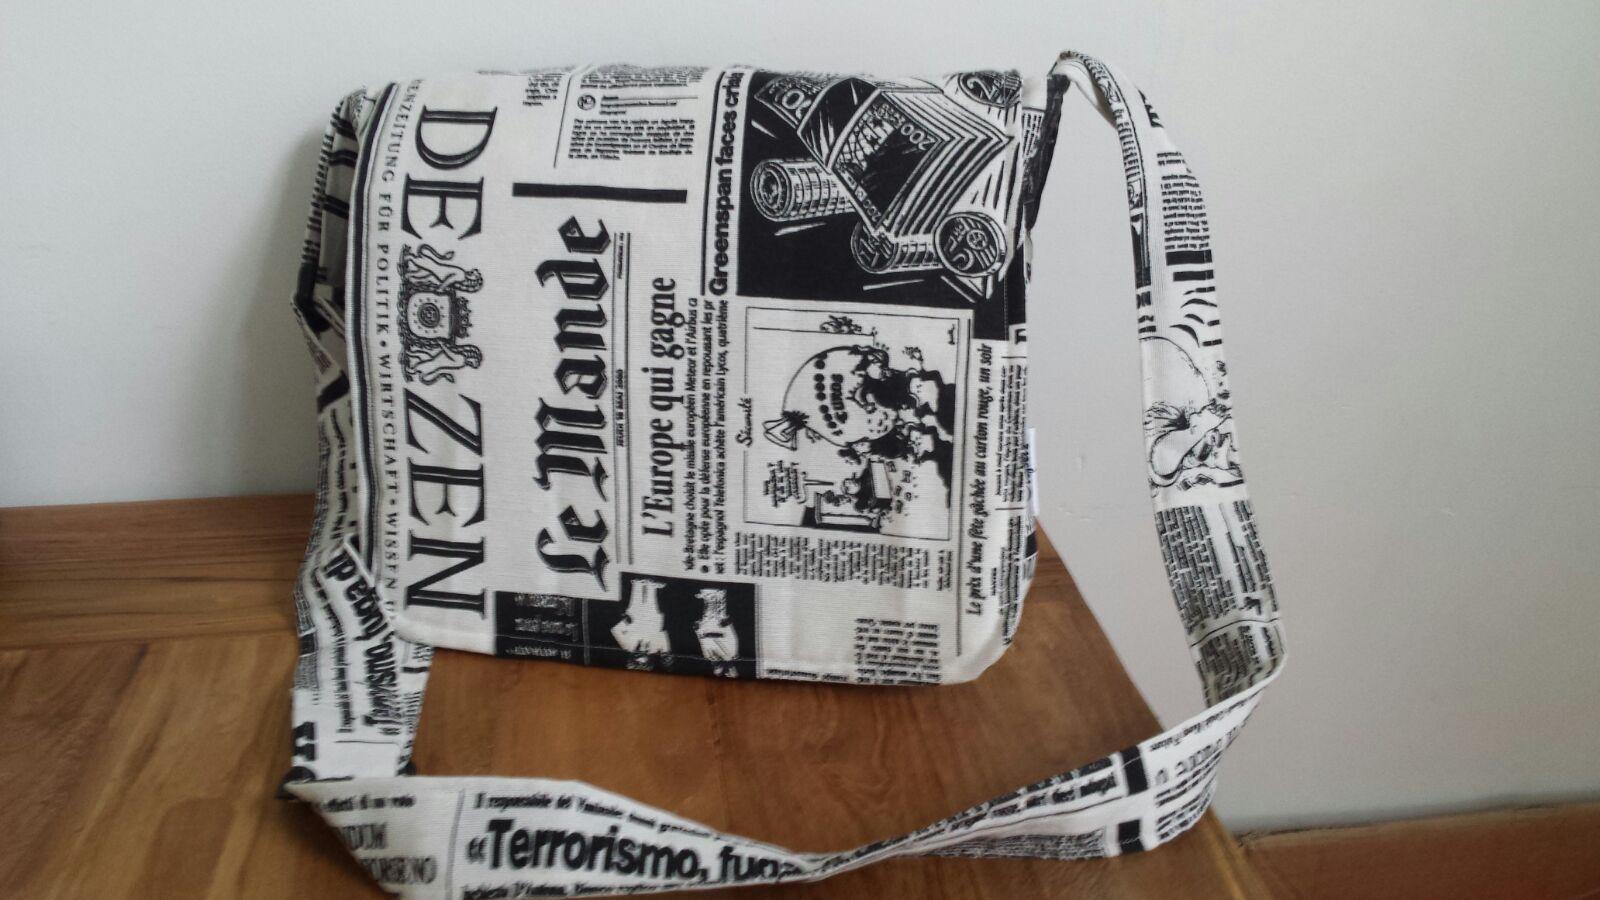 Tas gemaakt van toneelkleding; toneelstuk: Titanic